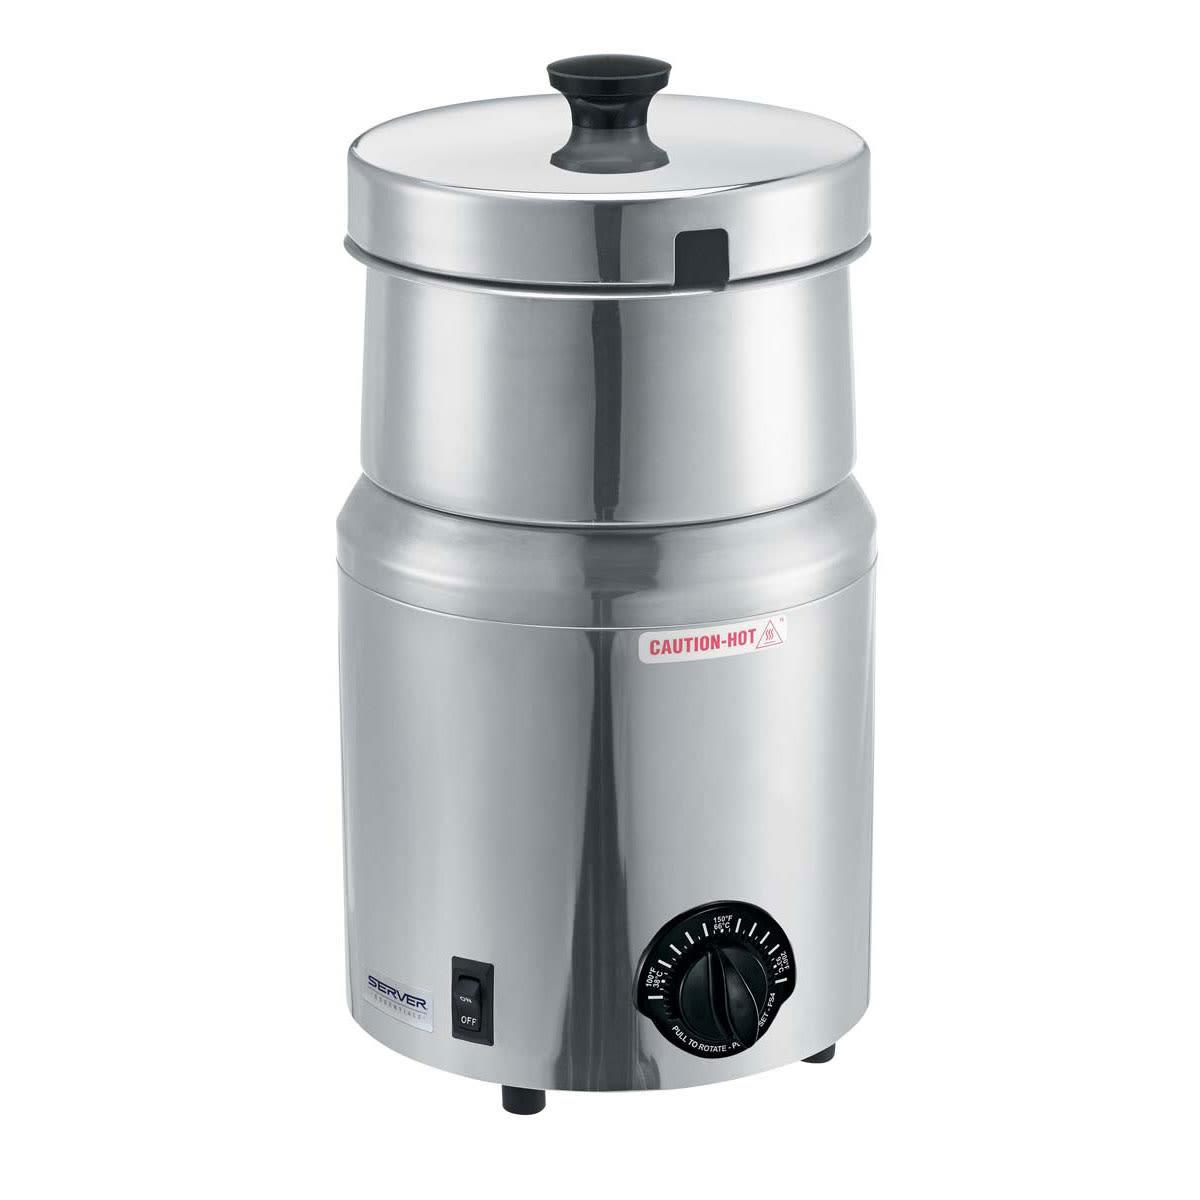 Server 81000 5 qt Countertop Soup Warmer w/ Thermostatic Controls, 120v